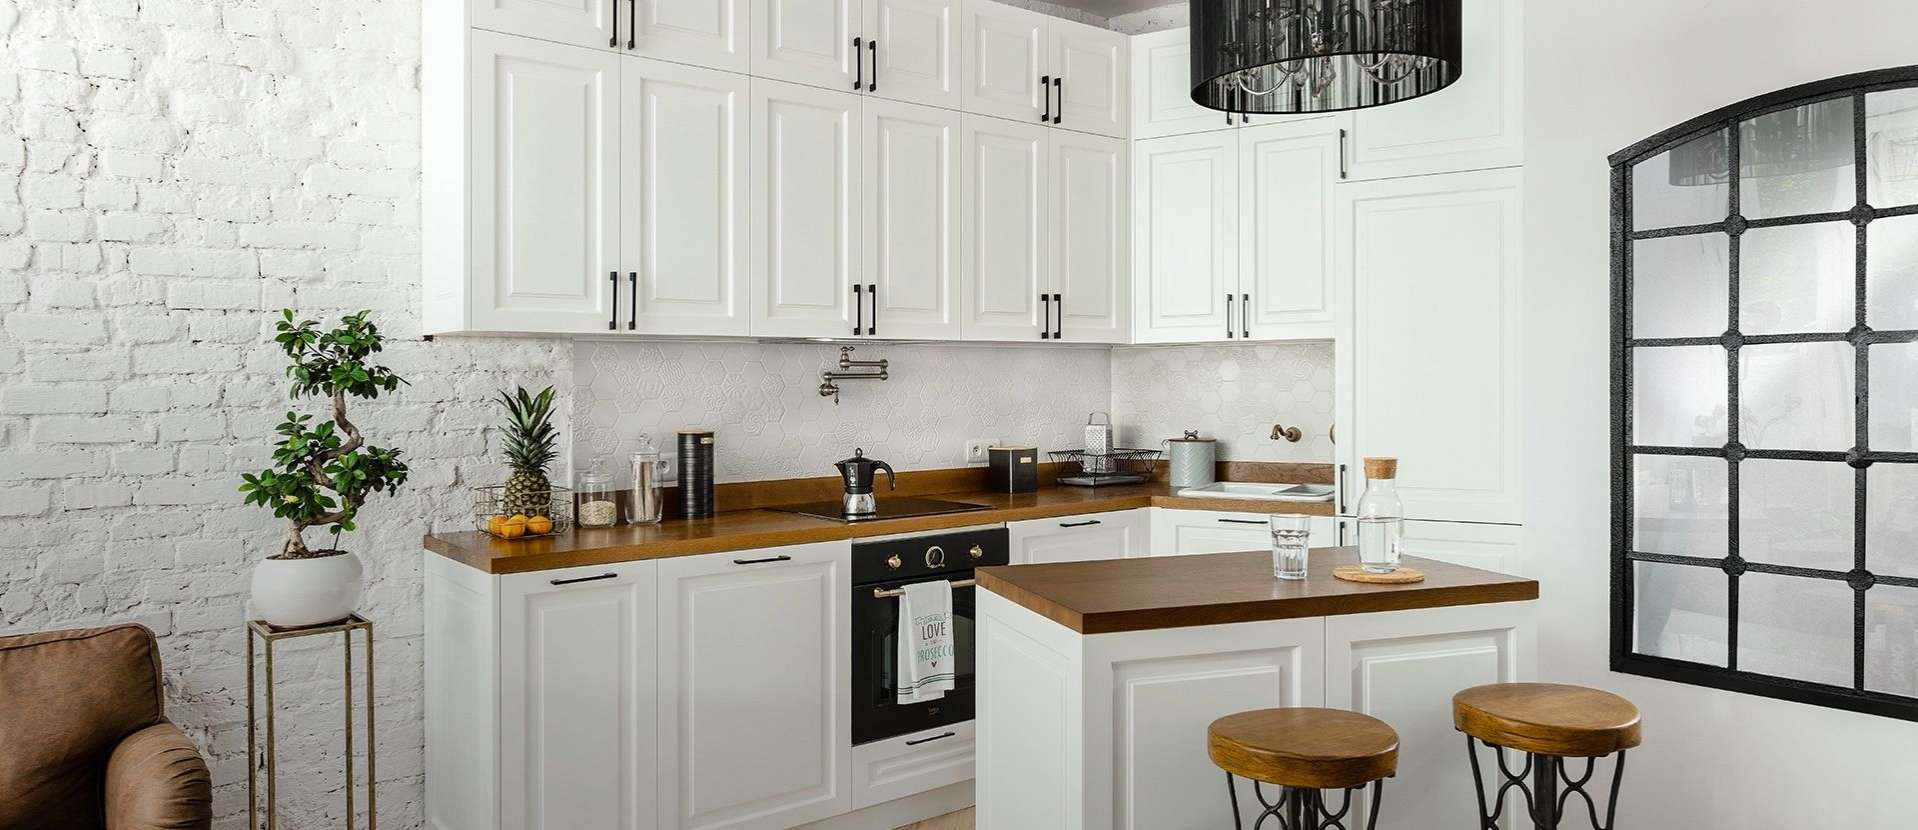 A wellorganised kitchen